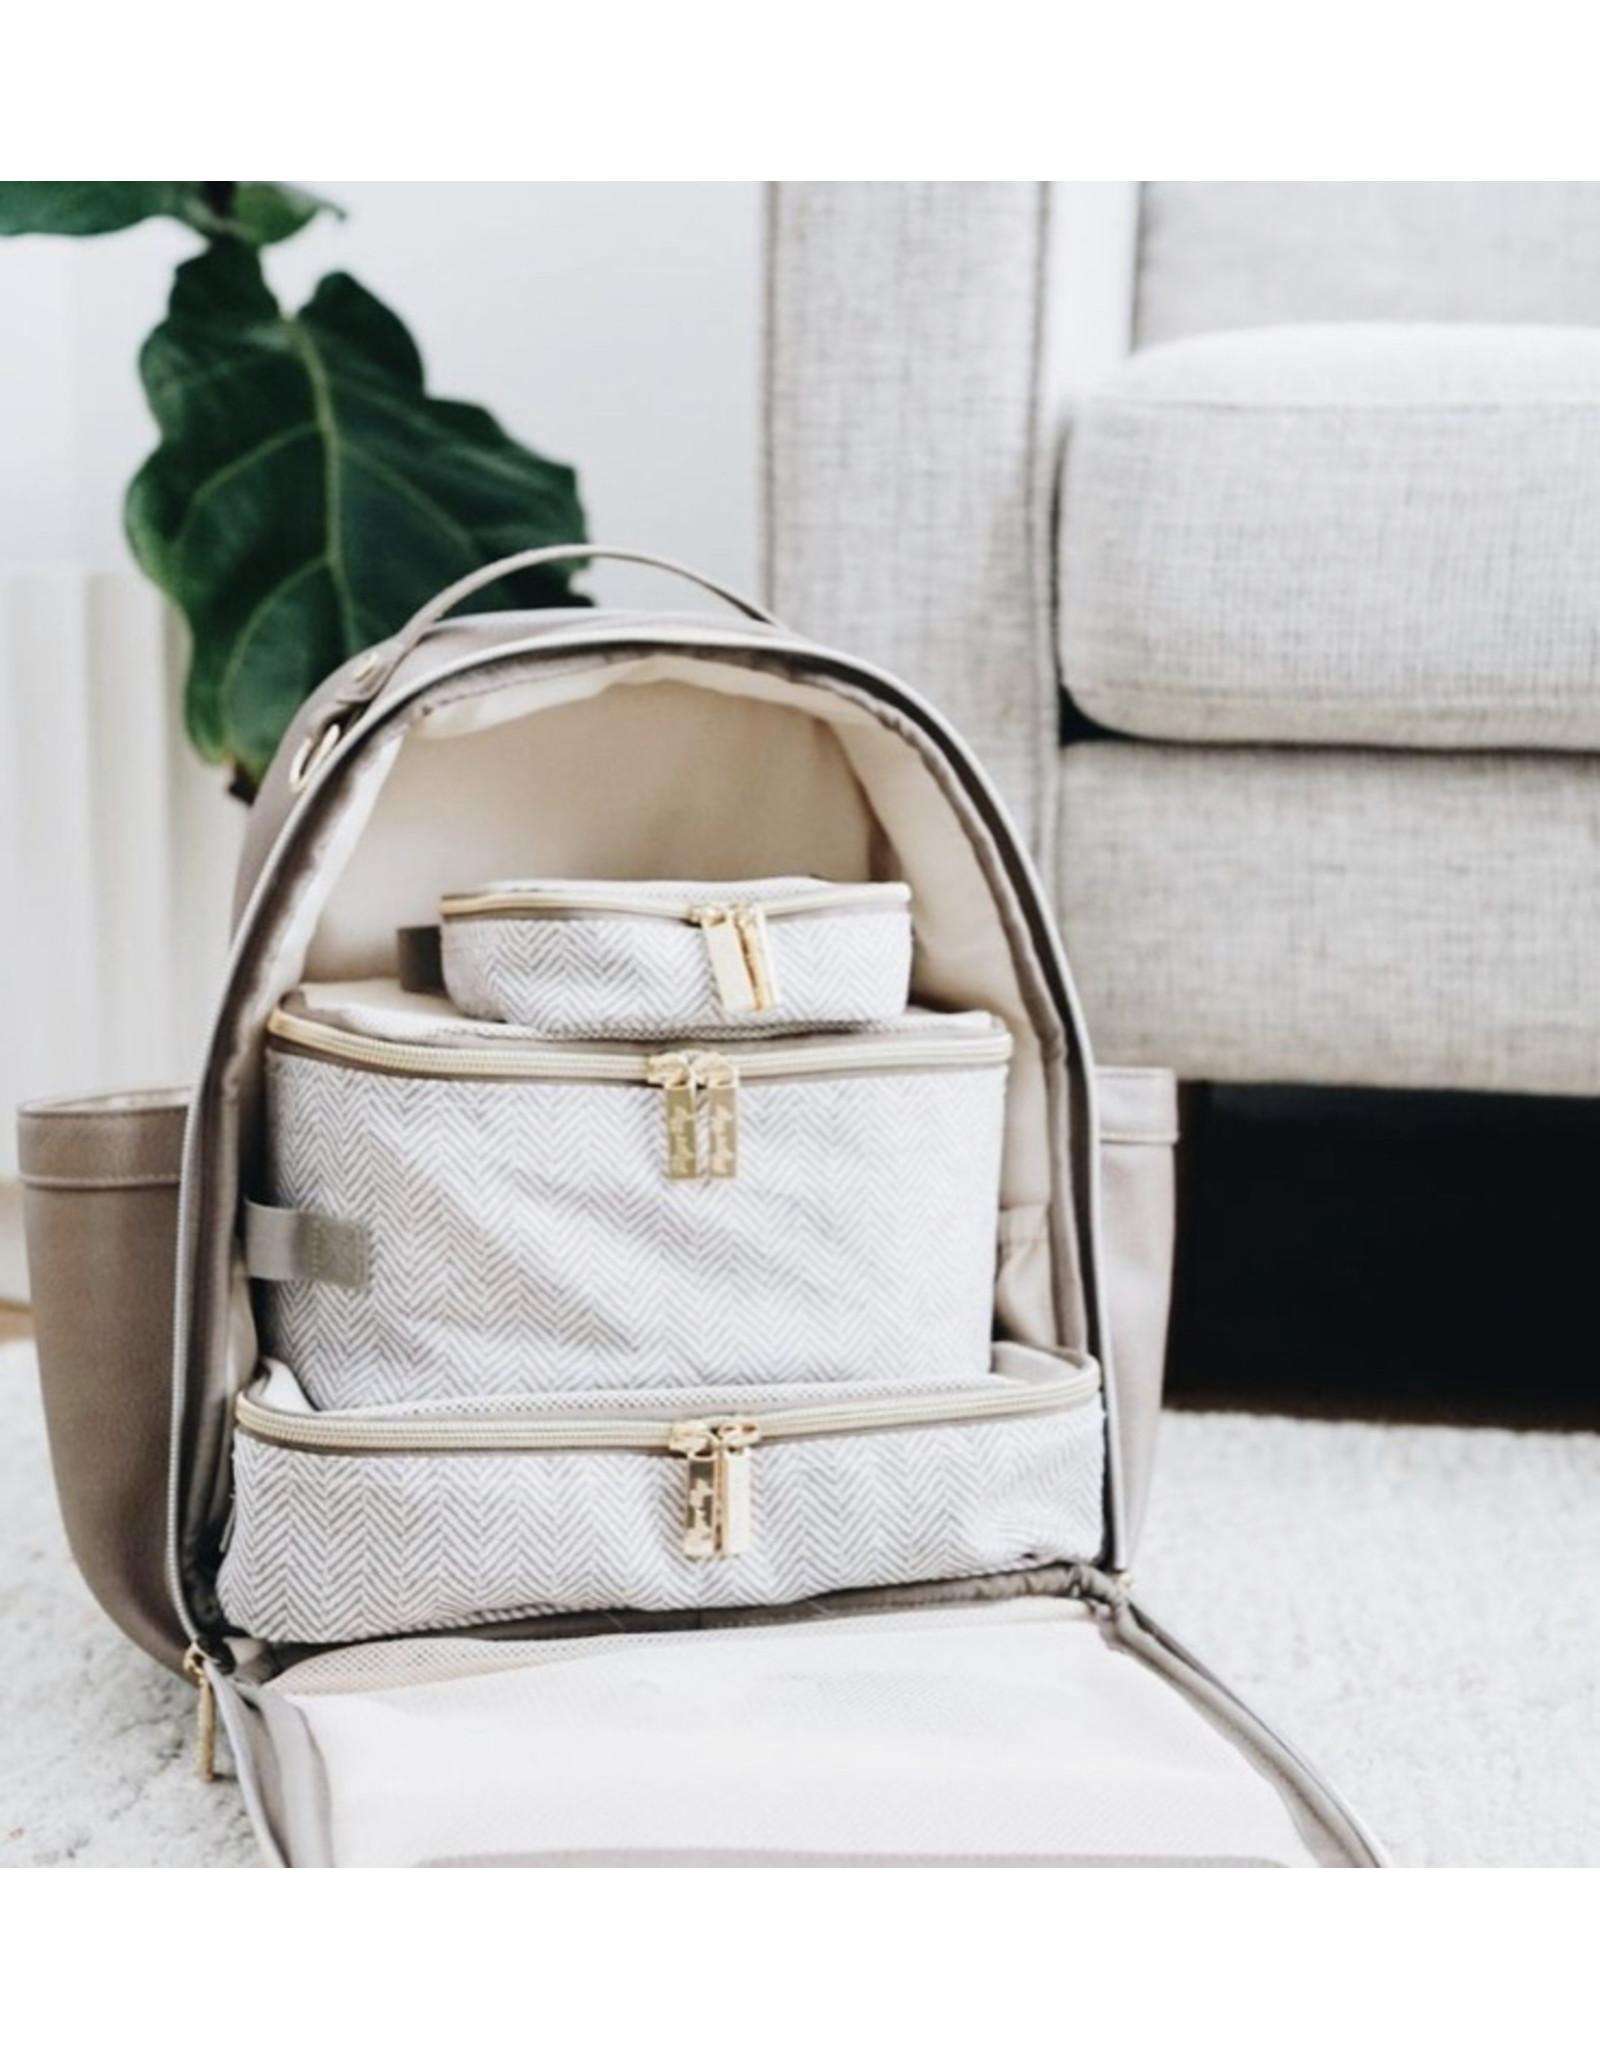 Itzy Ritzy Itzy Ritzy Diaper Bag Backpack, Vanilla Latte